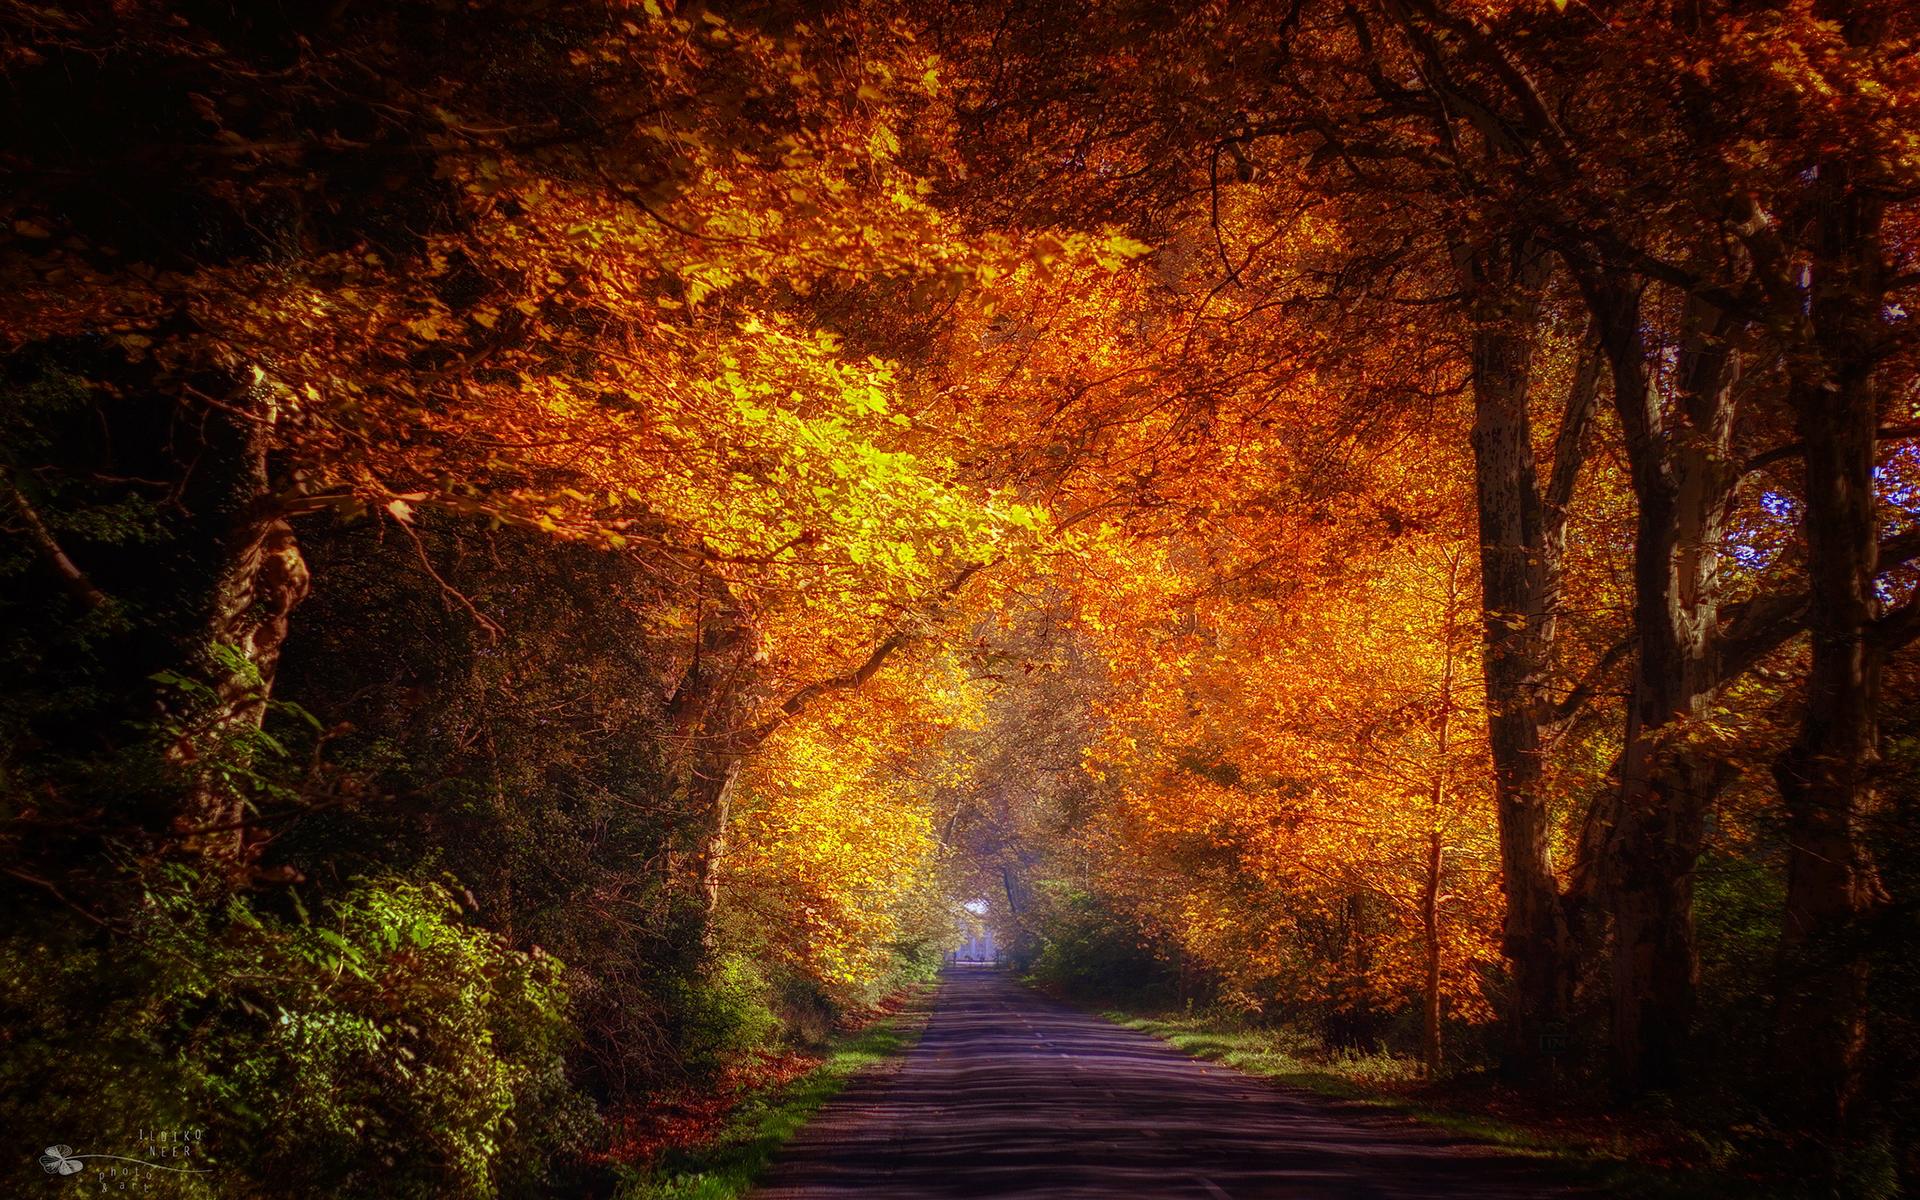 National Geographic Wallpaper Fall Foliage Autumn Road Morning Hd Desktop Wallpapers 4k Hd